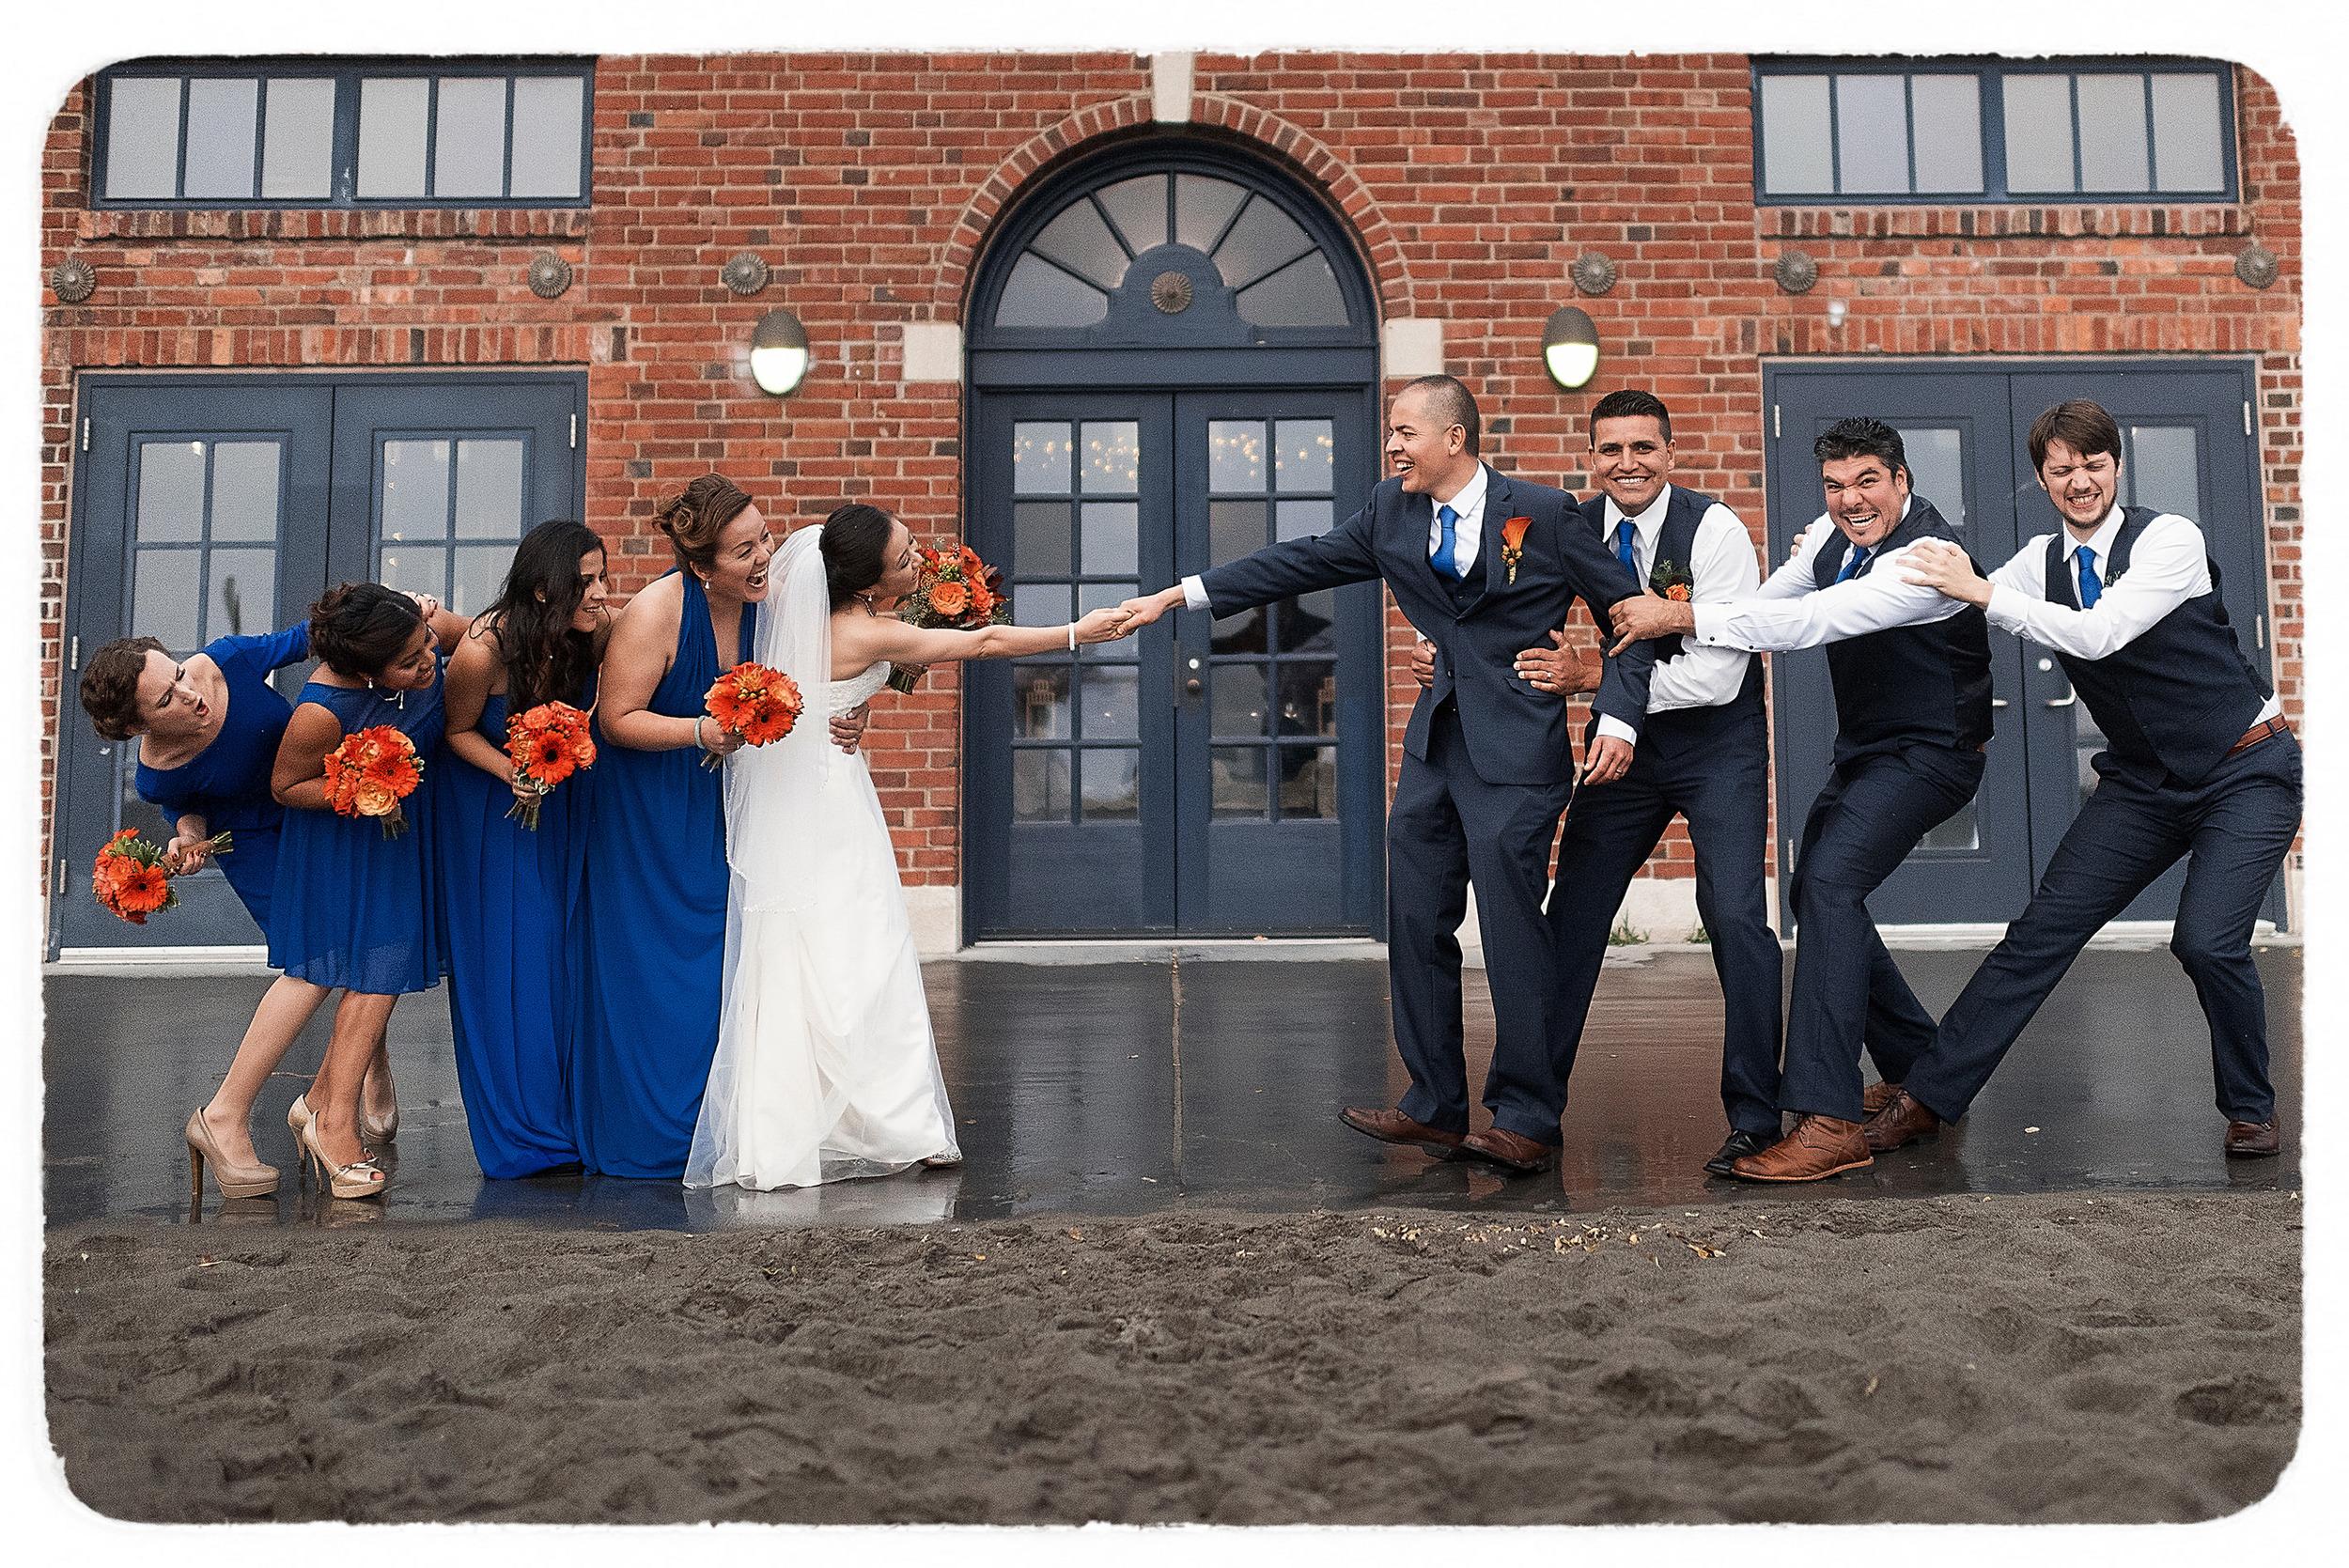 Kate&Jose-Wedding-OriginalCollection-312Film.jpg